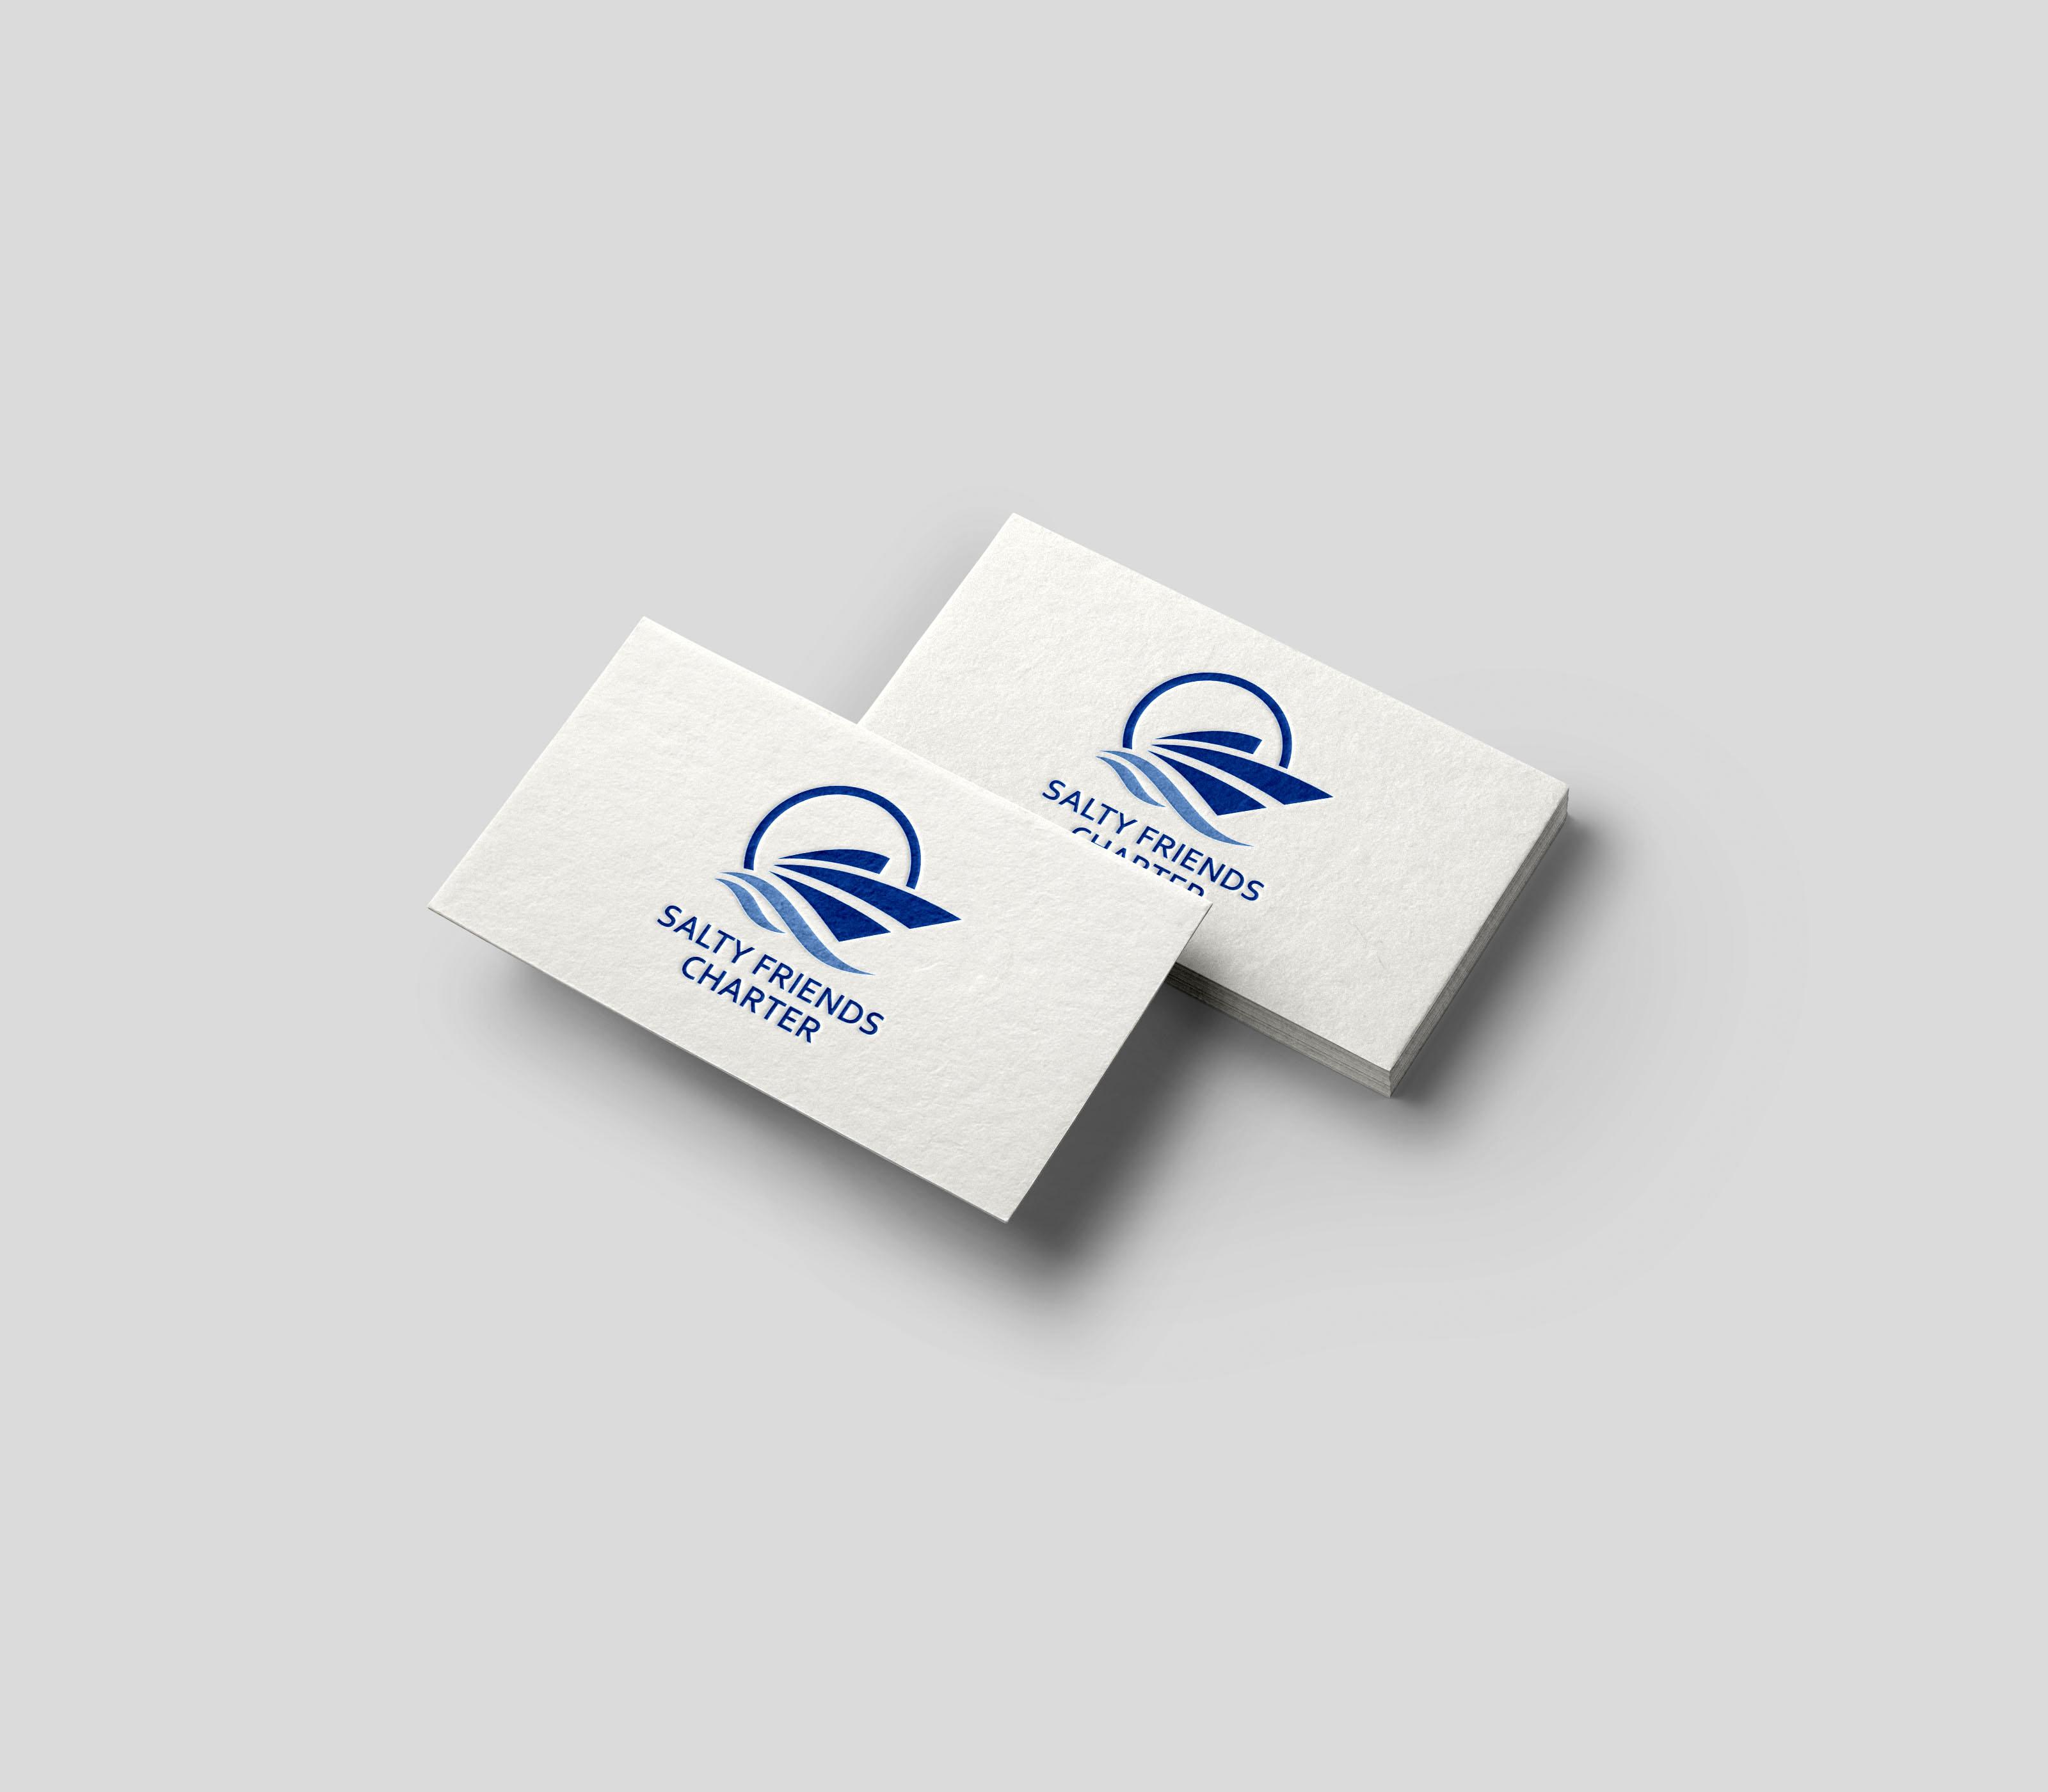 Разработка логотипа и наименования для чартерной компании  фото f_8355a96ca7b6dc7b.jpg